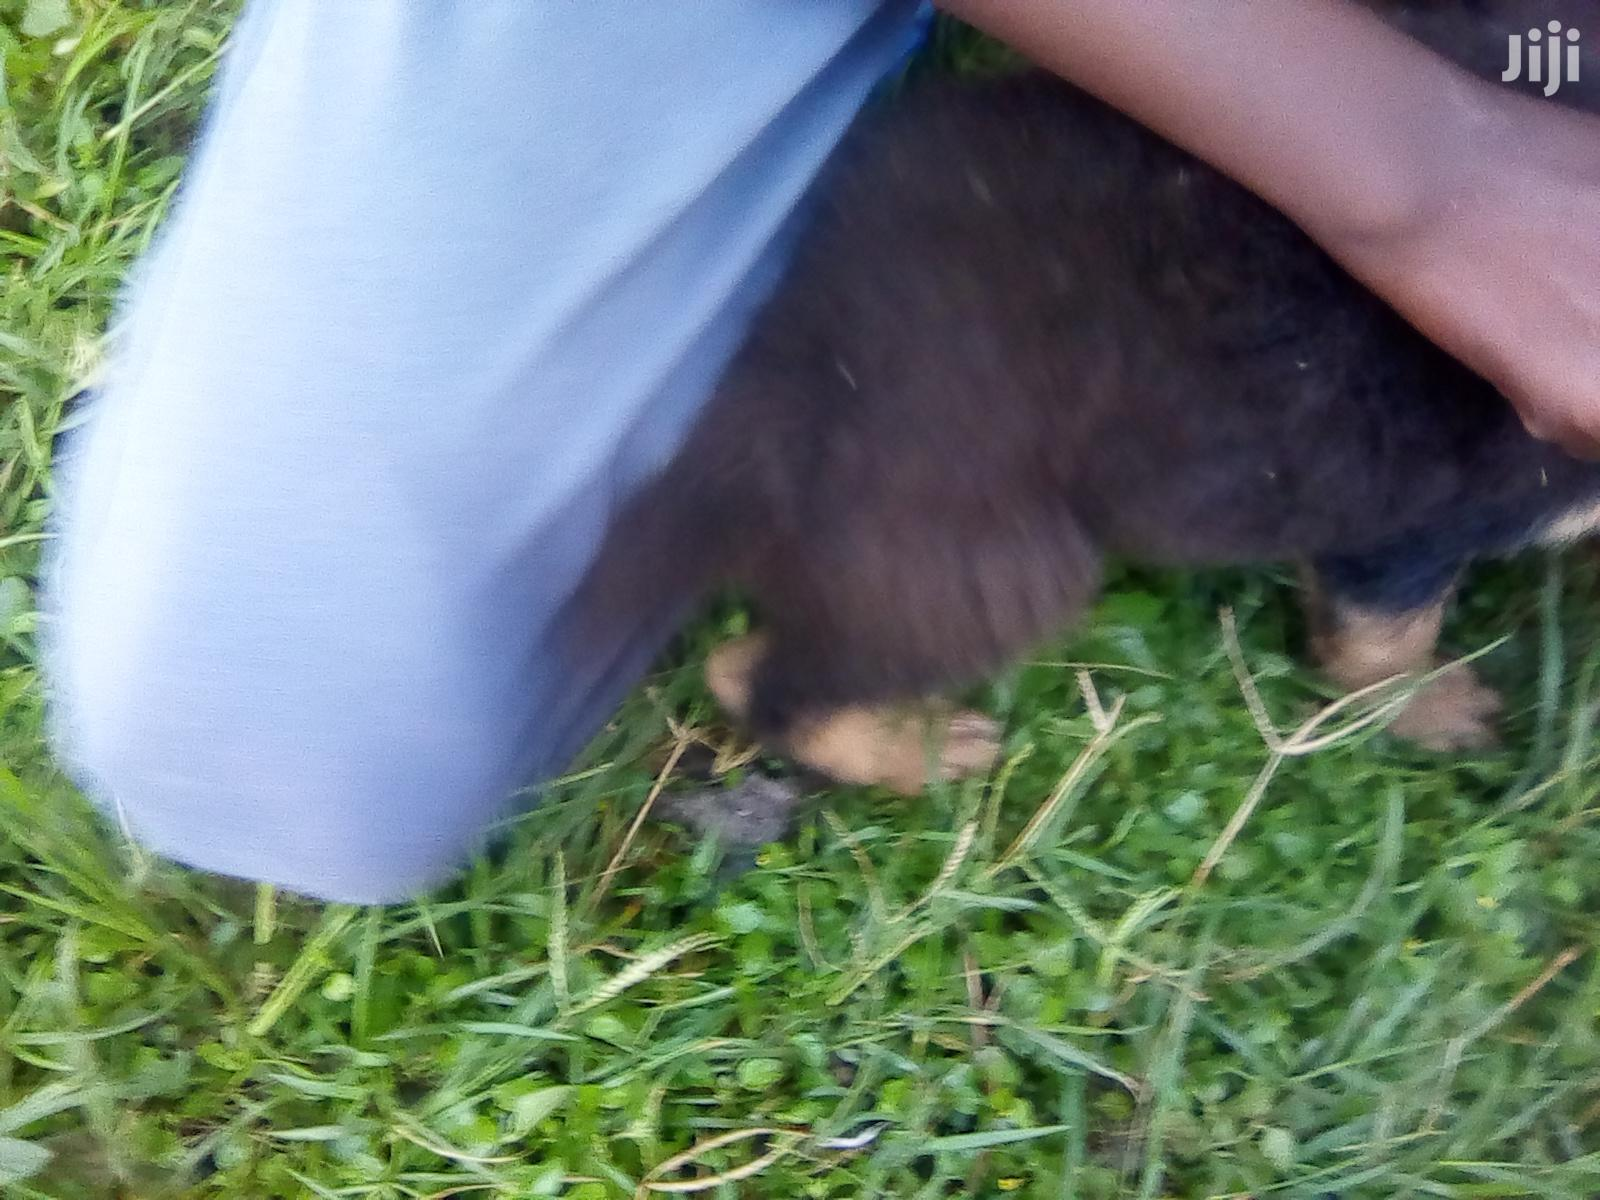 Archive: Baby Male Mixed Breed German Shepherd